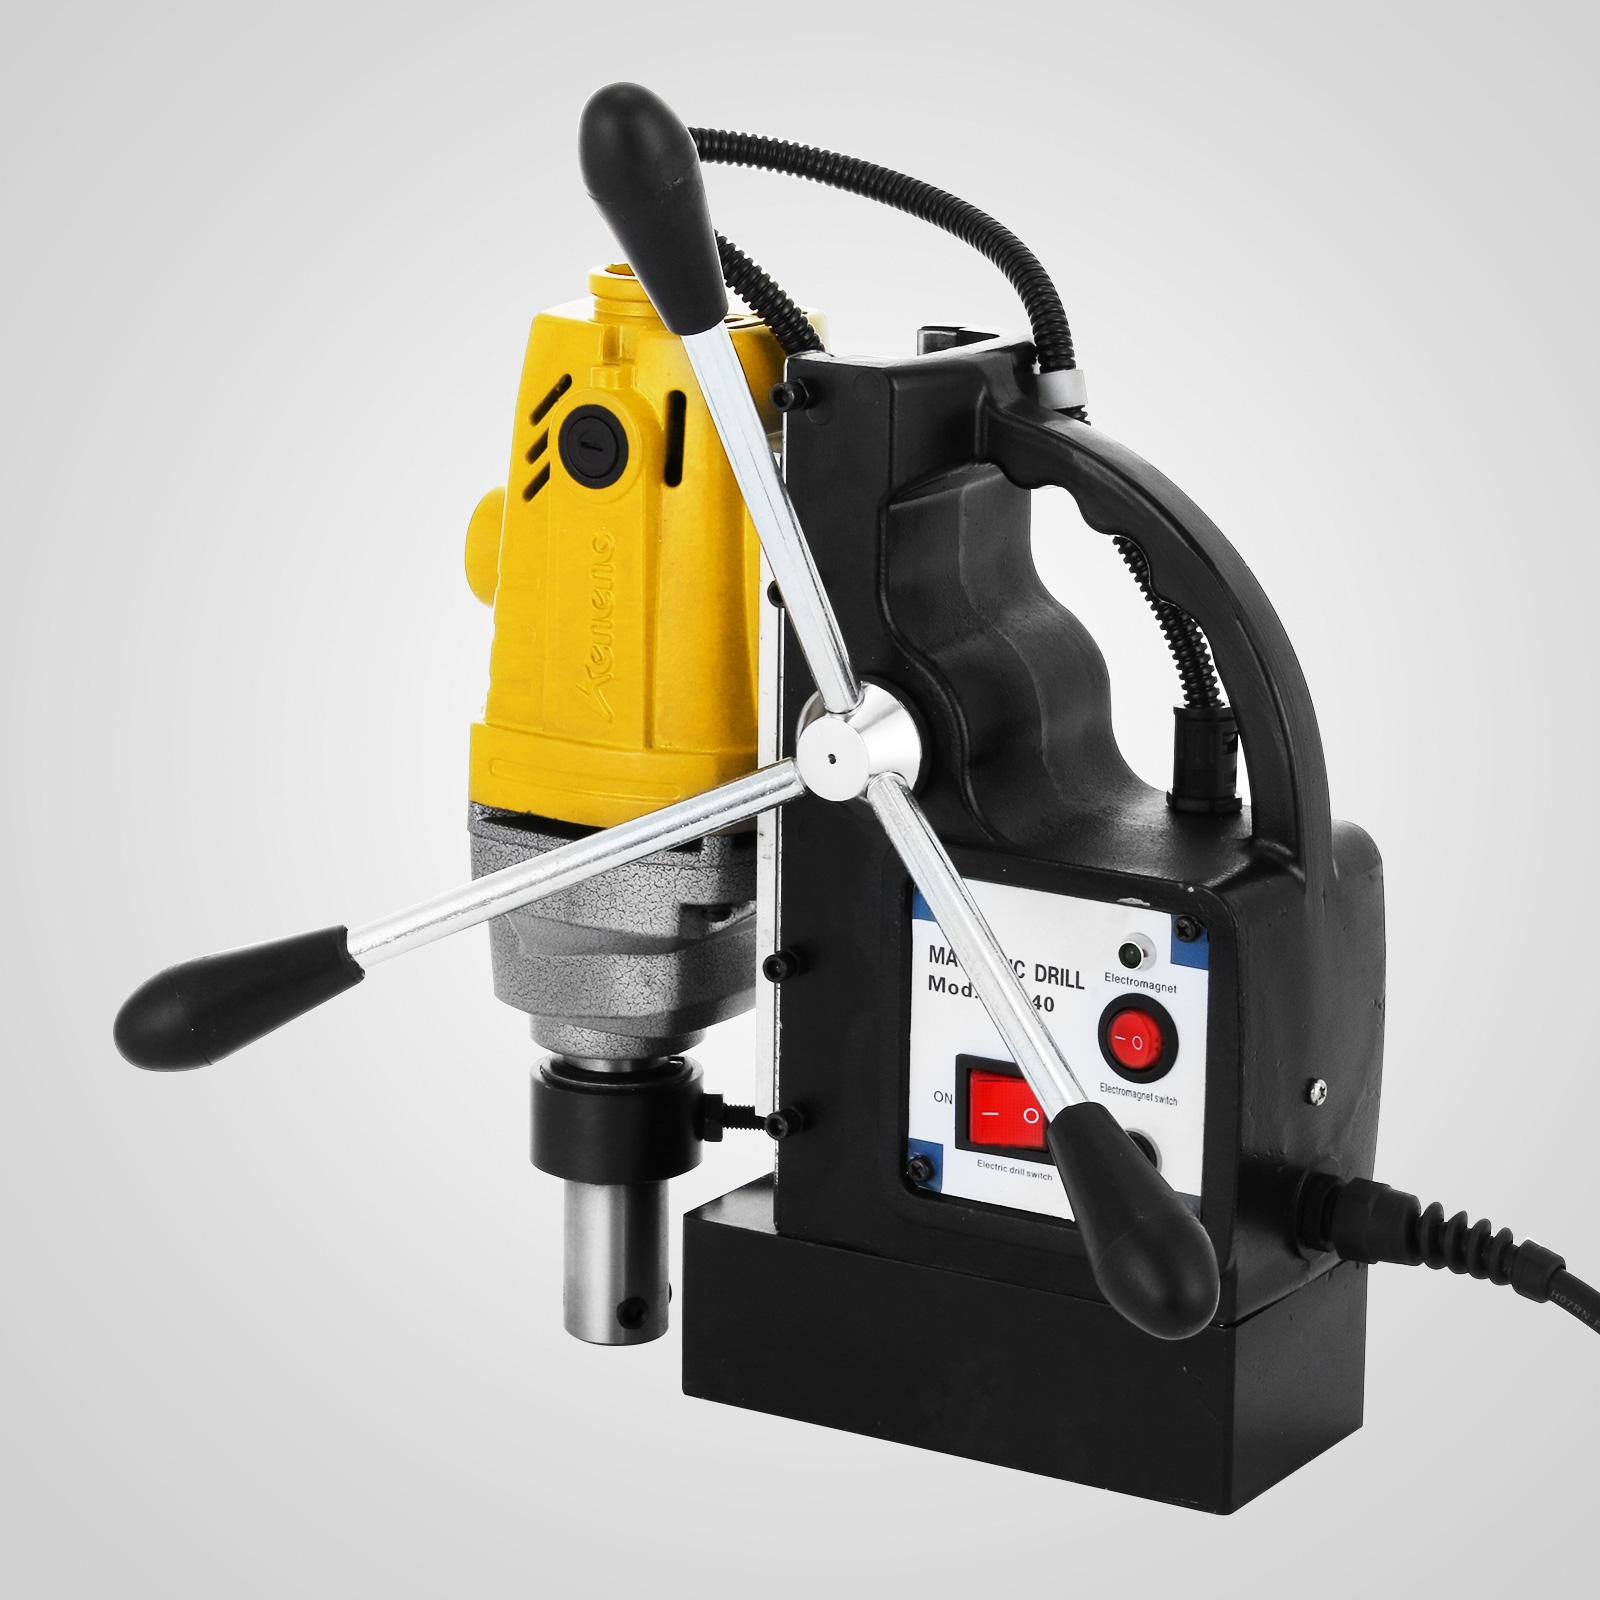 MB23-BRM35-MD40-Trapano-Perforatrice-Carotatore-Fresa-Magnetico-12-40mm-230V miniatura 16